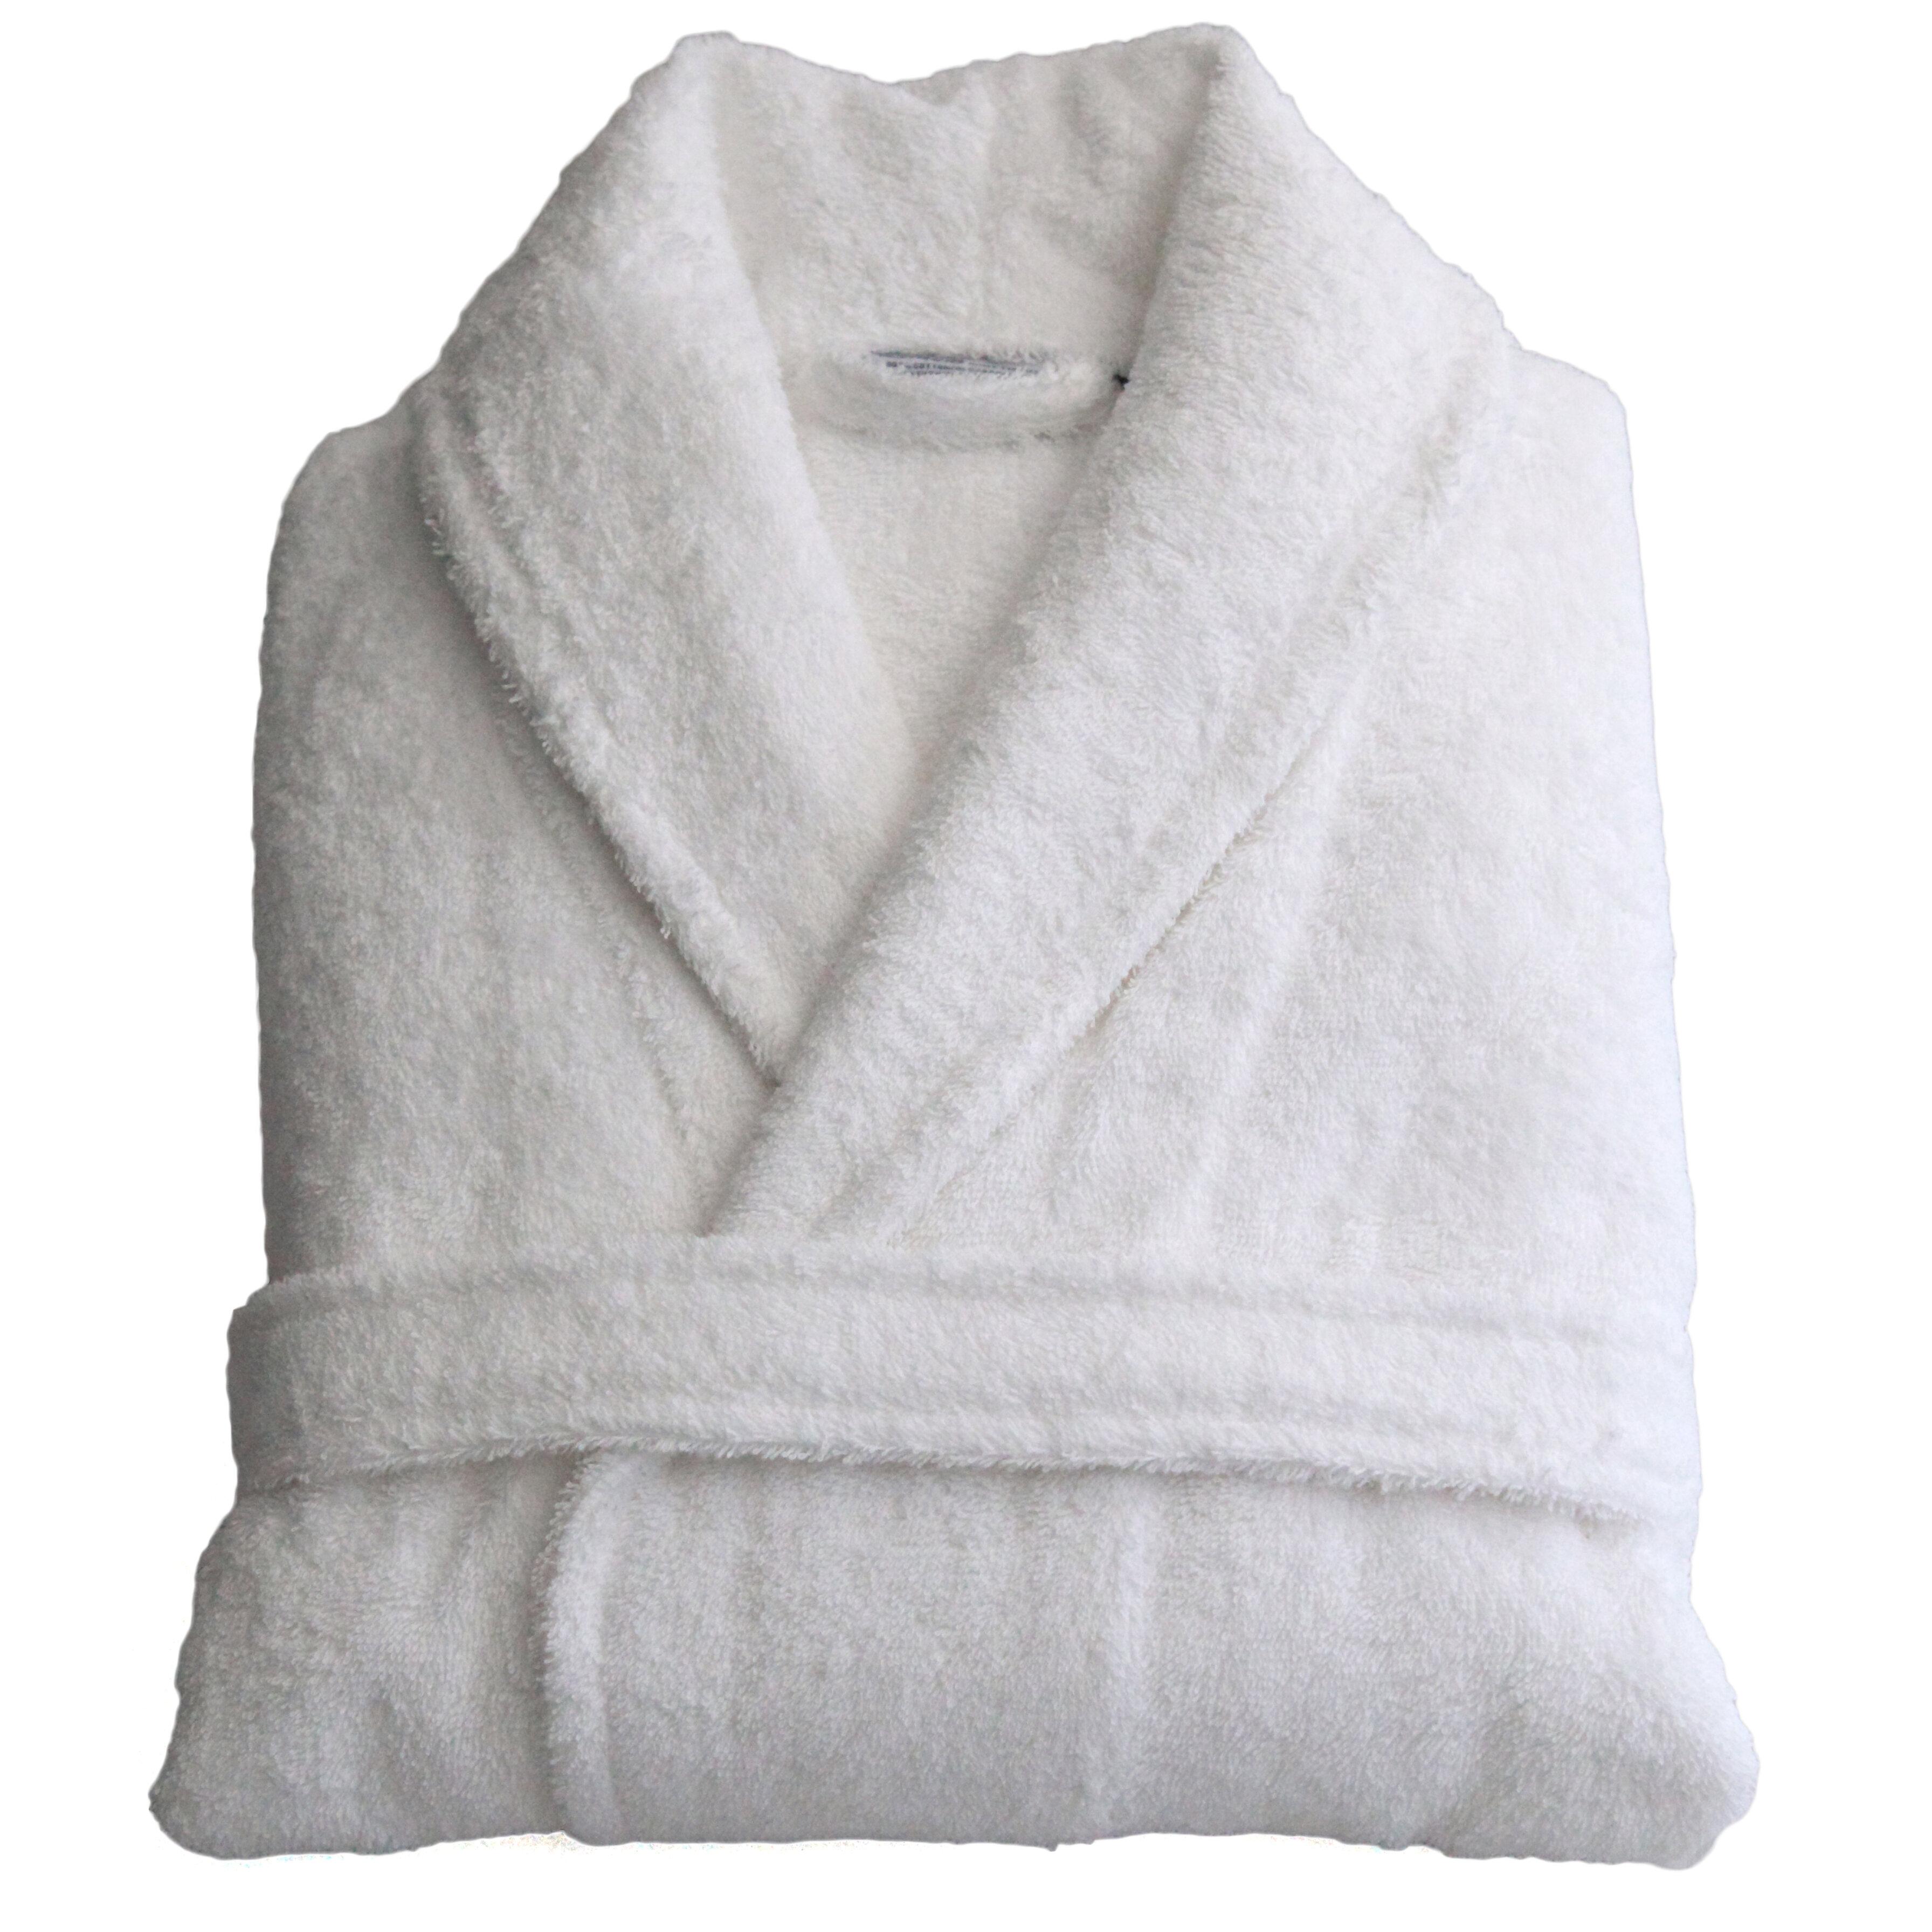 Women/'s short beige plush fleece bath robe with shawl collar Cotton white robe High quality handmade robe Home suit Handknit sweater